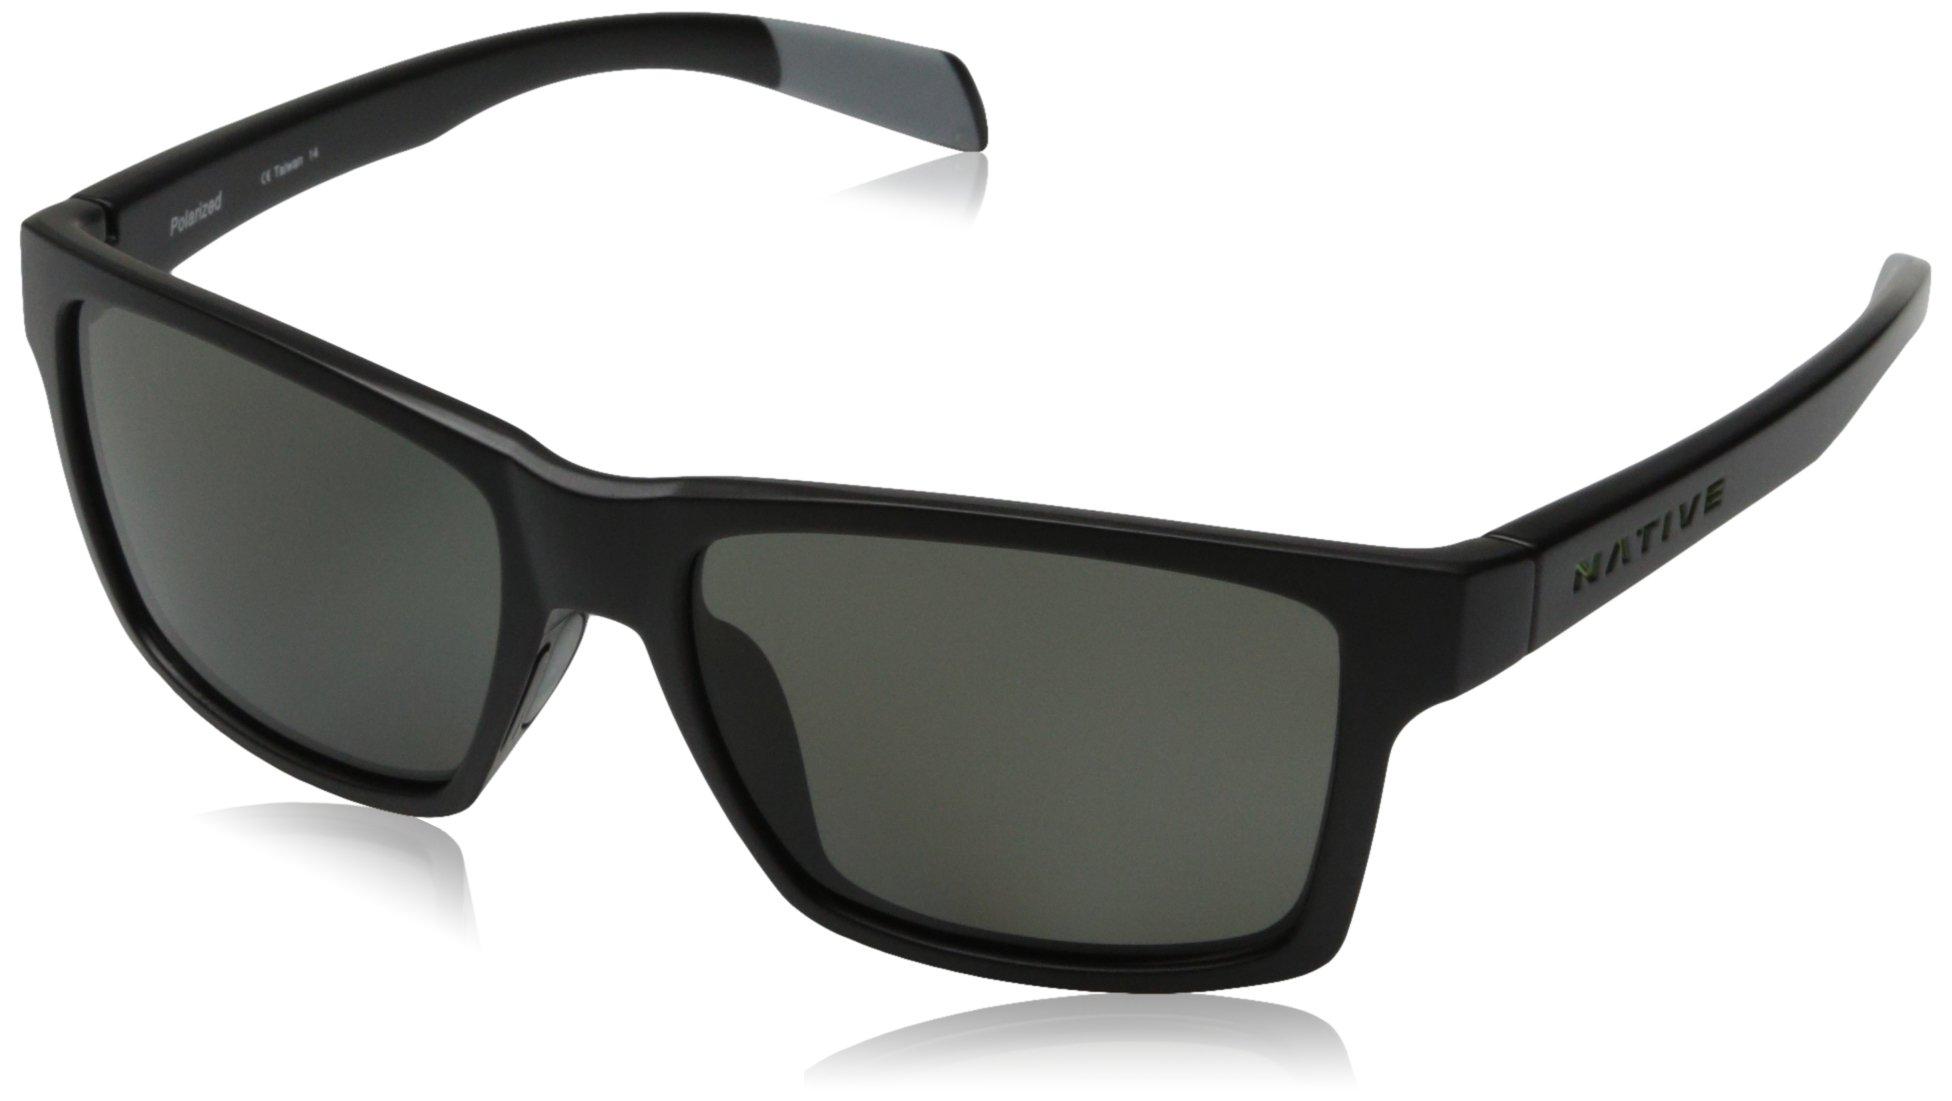 Native Eyewear Flatirons Polarized Sunglasses,Matte Black Frame, Gray Lens